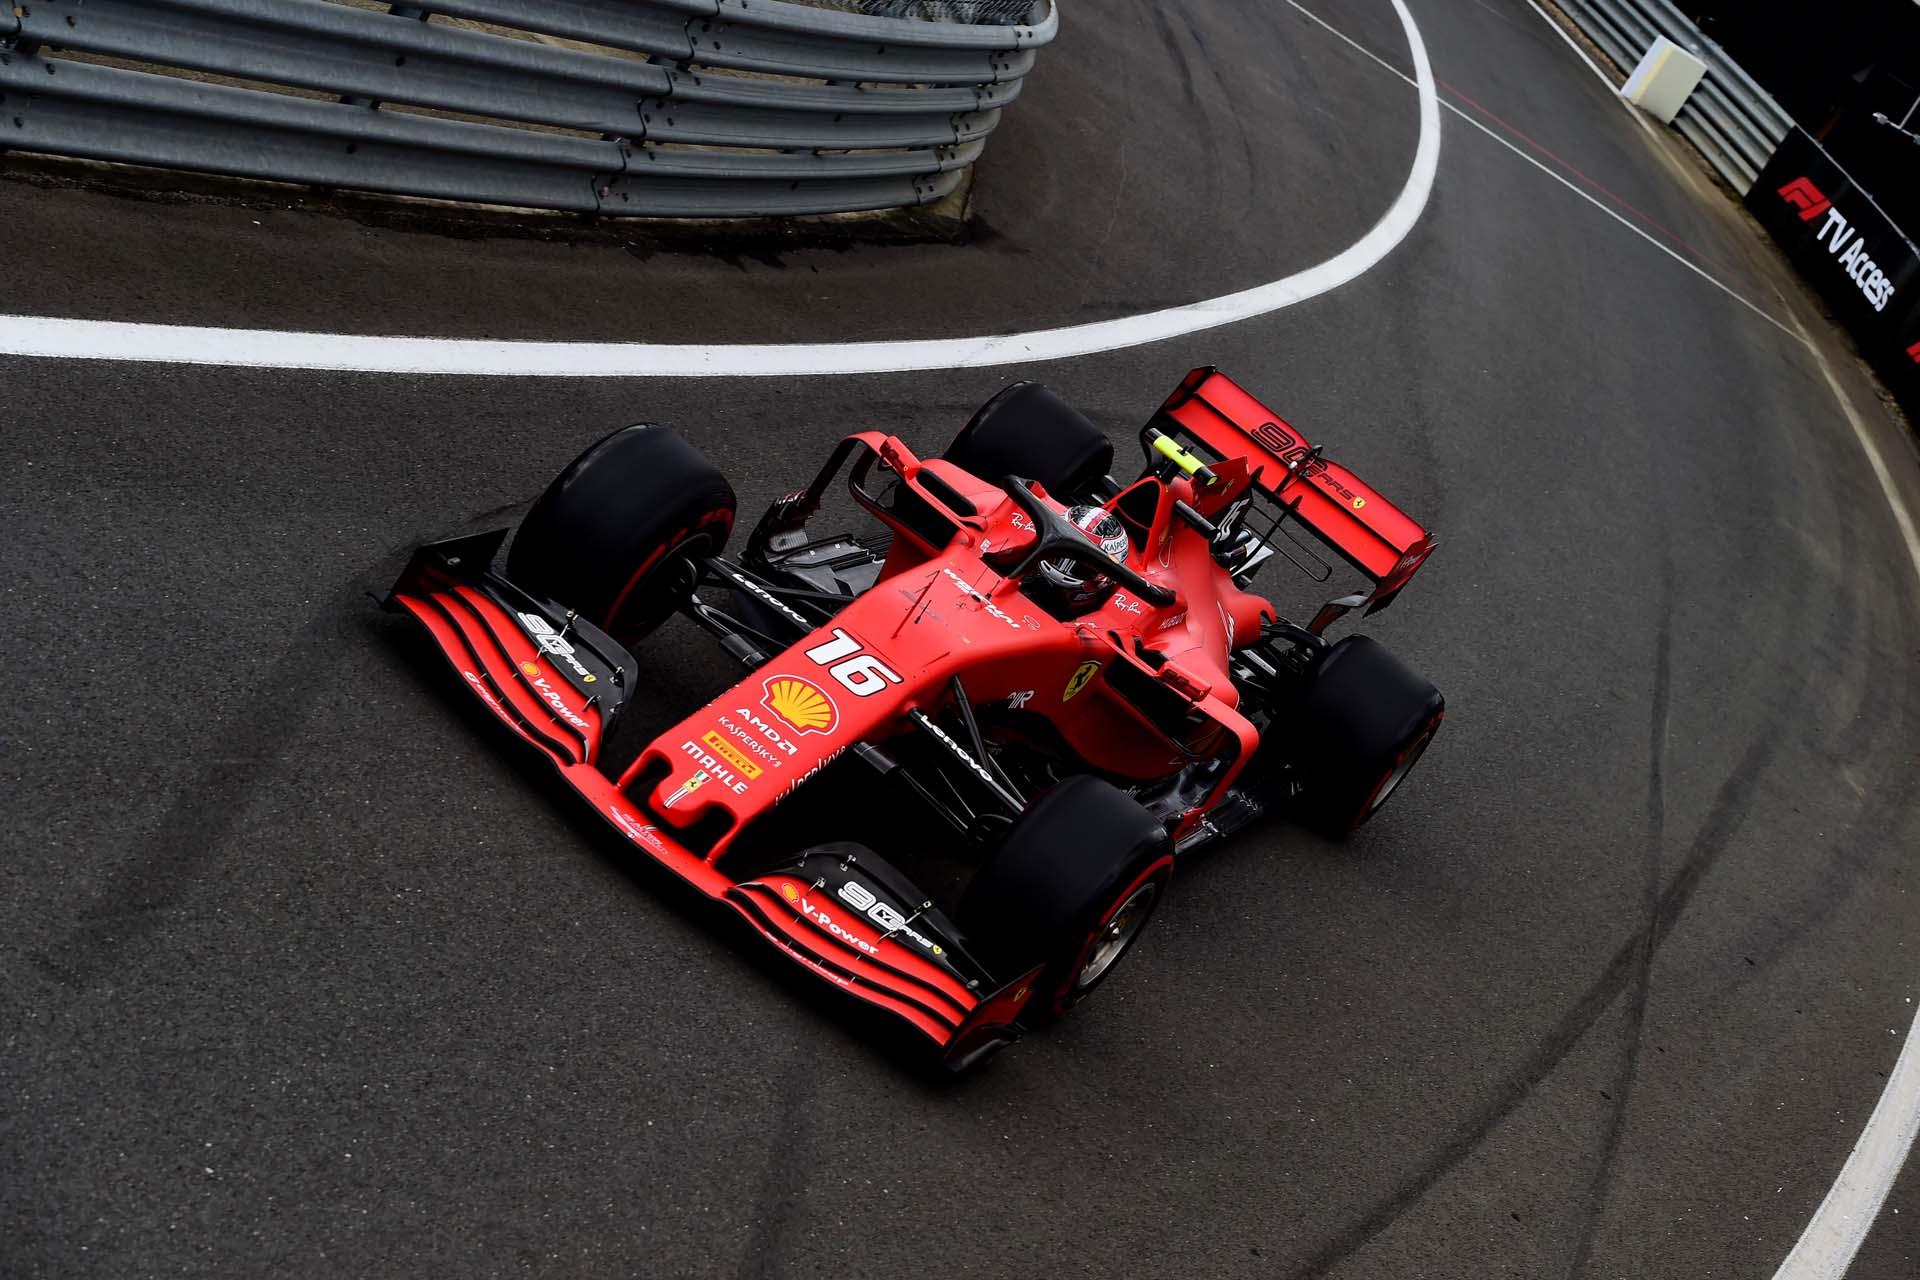 GP GRAN BRETAGNA F1/2019 - VENERDÌ 12/07/2019 credit: @Scuderia Ferrari Press Office Charles Leclerc Ferrari